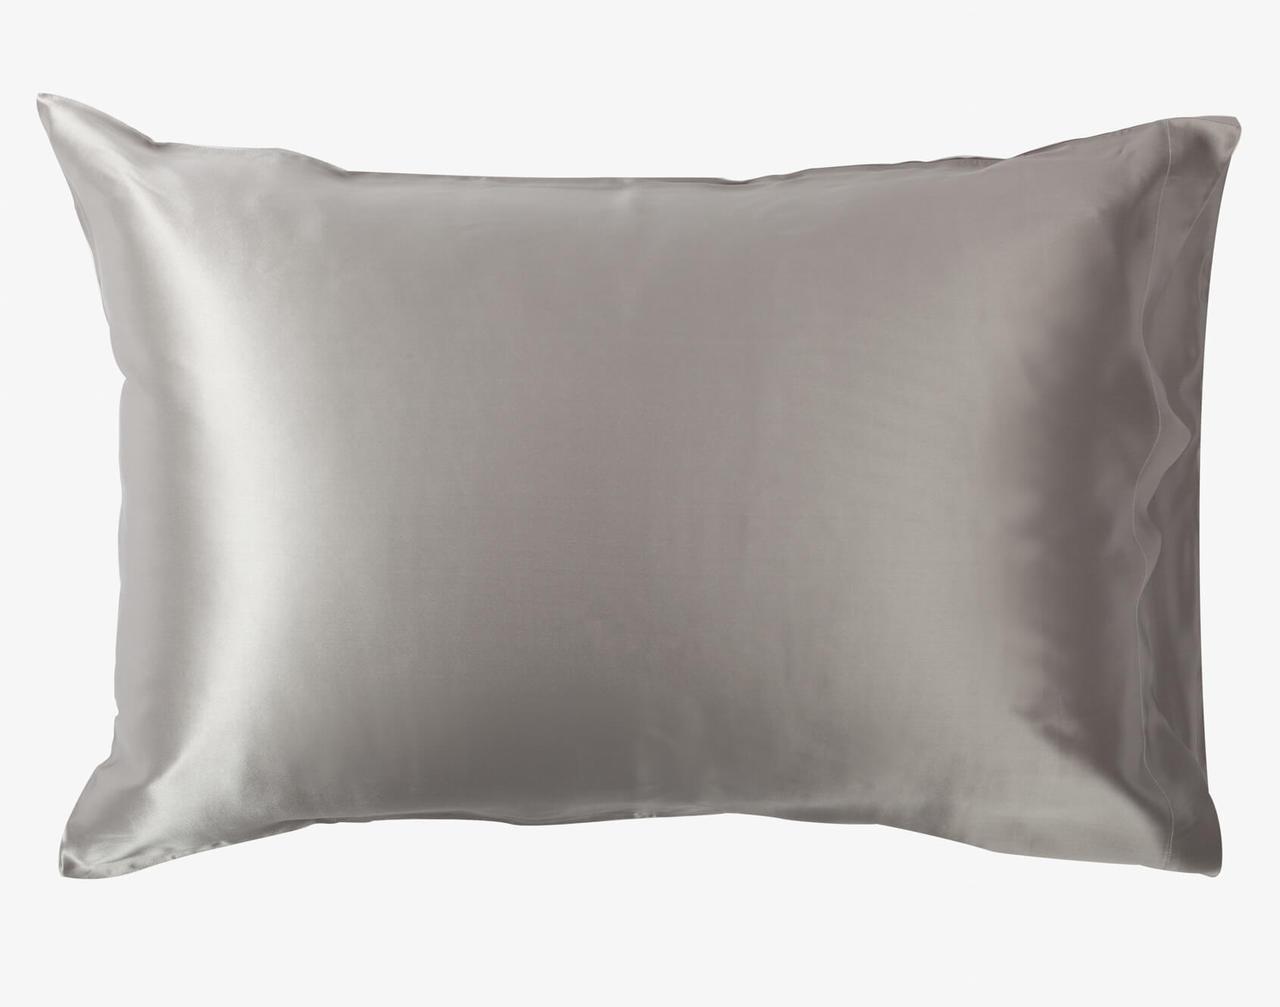 100% Mulberry Silk Pillowcase in Silver.